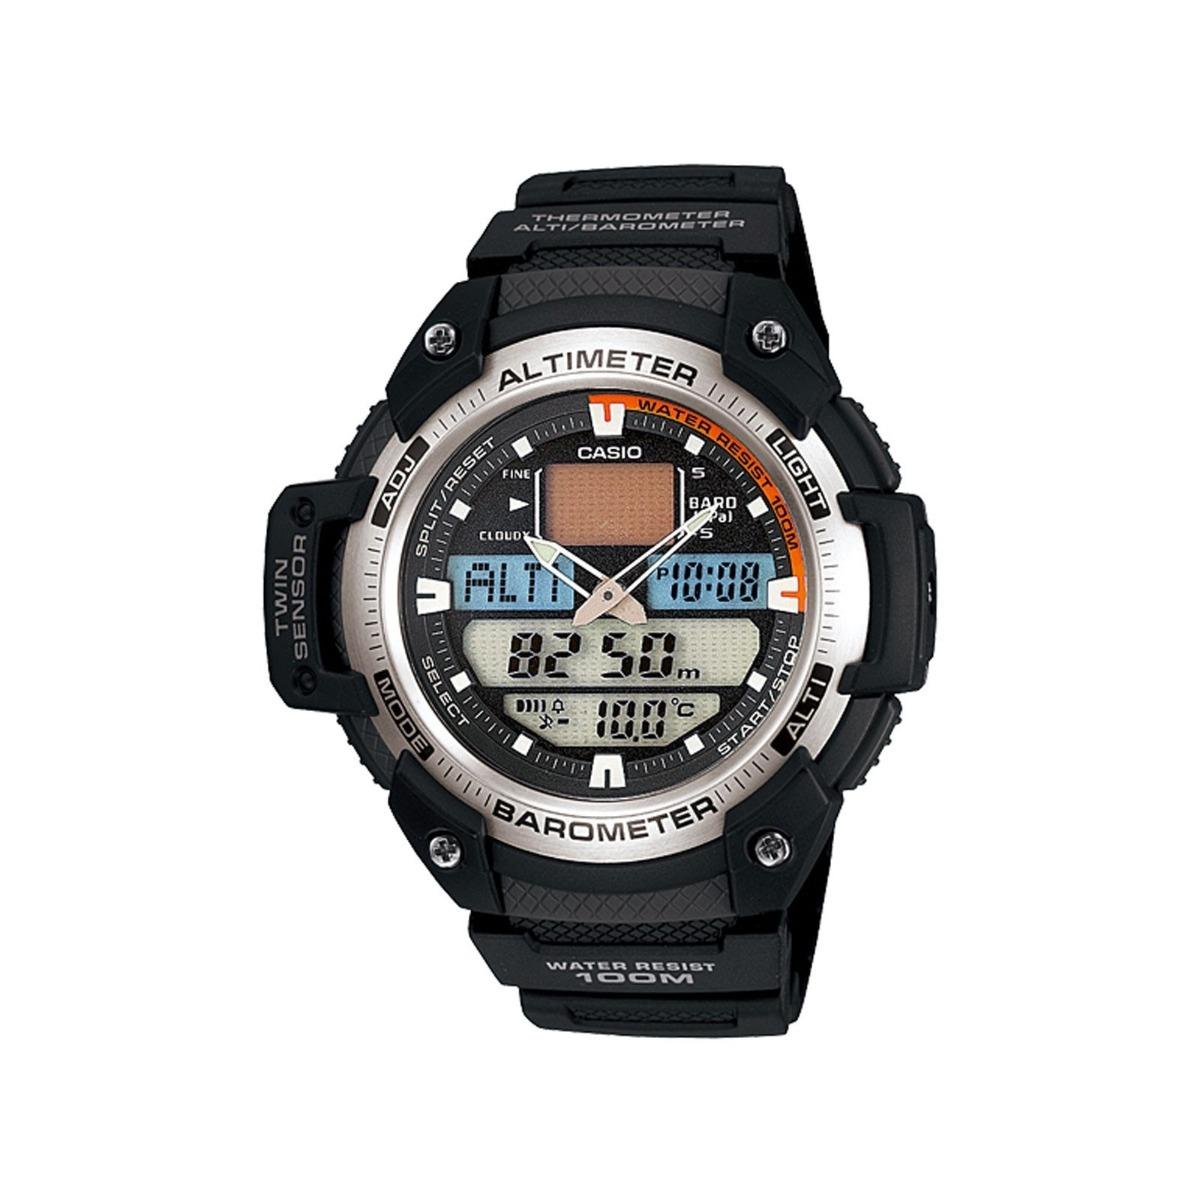 relogio casio esportivo masculino digital - sgw-400h-1bvdr. Carregando zoom. 9937102ee8